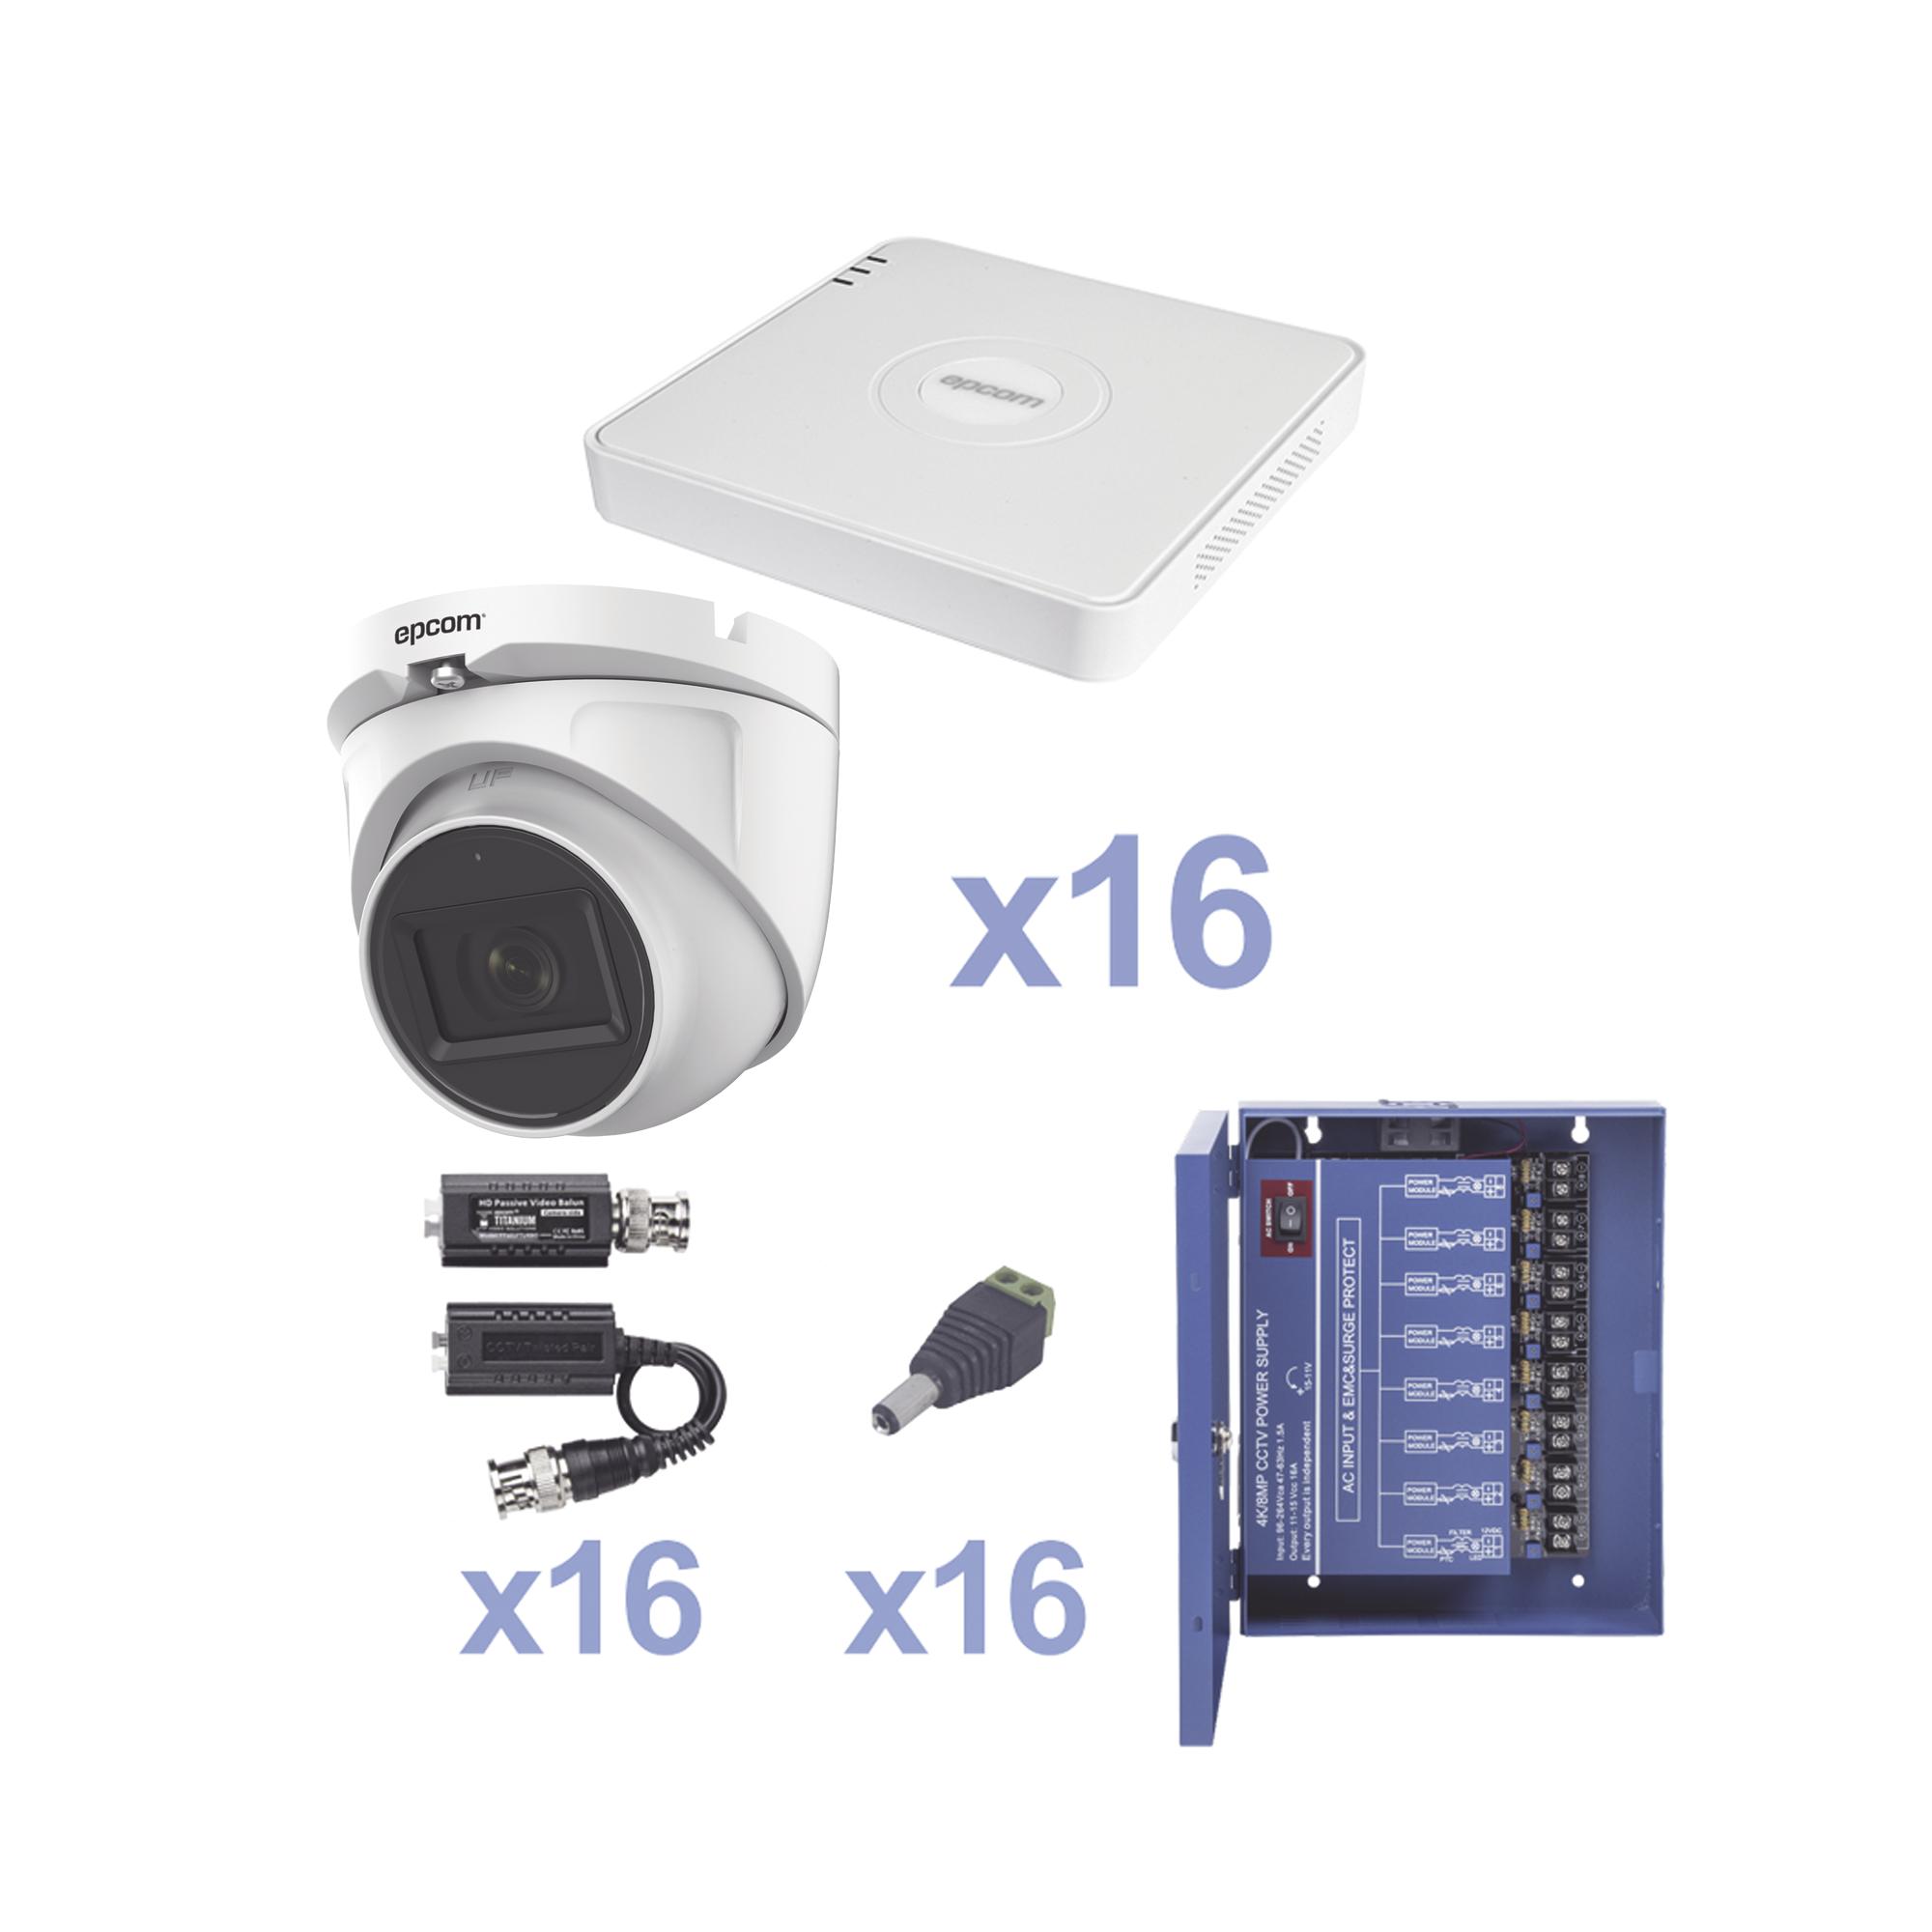 KIT TurboHD 720p / Incluye DVR 16ch / 16 cámaras domo 2.8mm / Transceptores / Conectores / Fuente de poder profesional Heavy Duty 20A, Hasta 15Vcd para Larga Distancia.